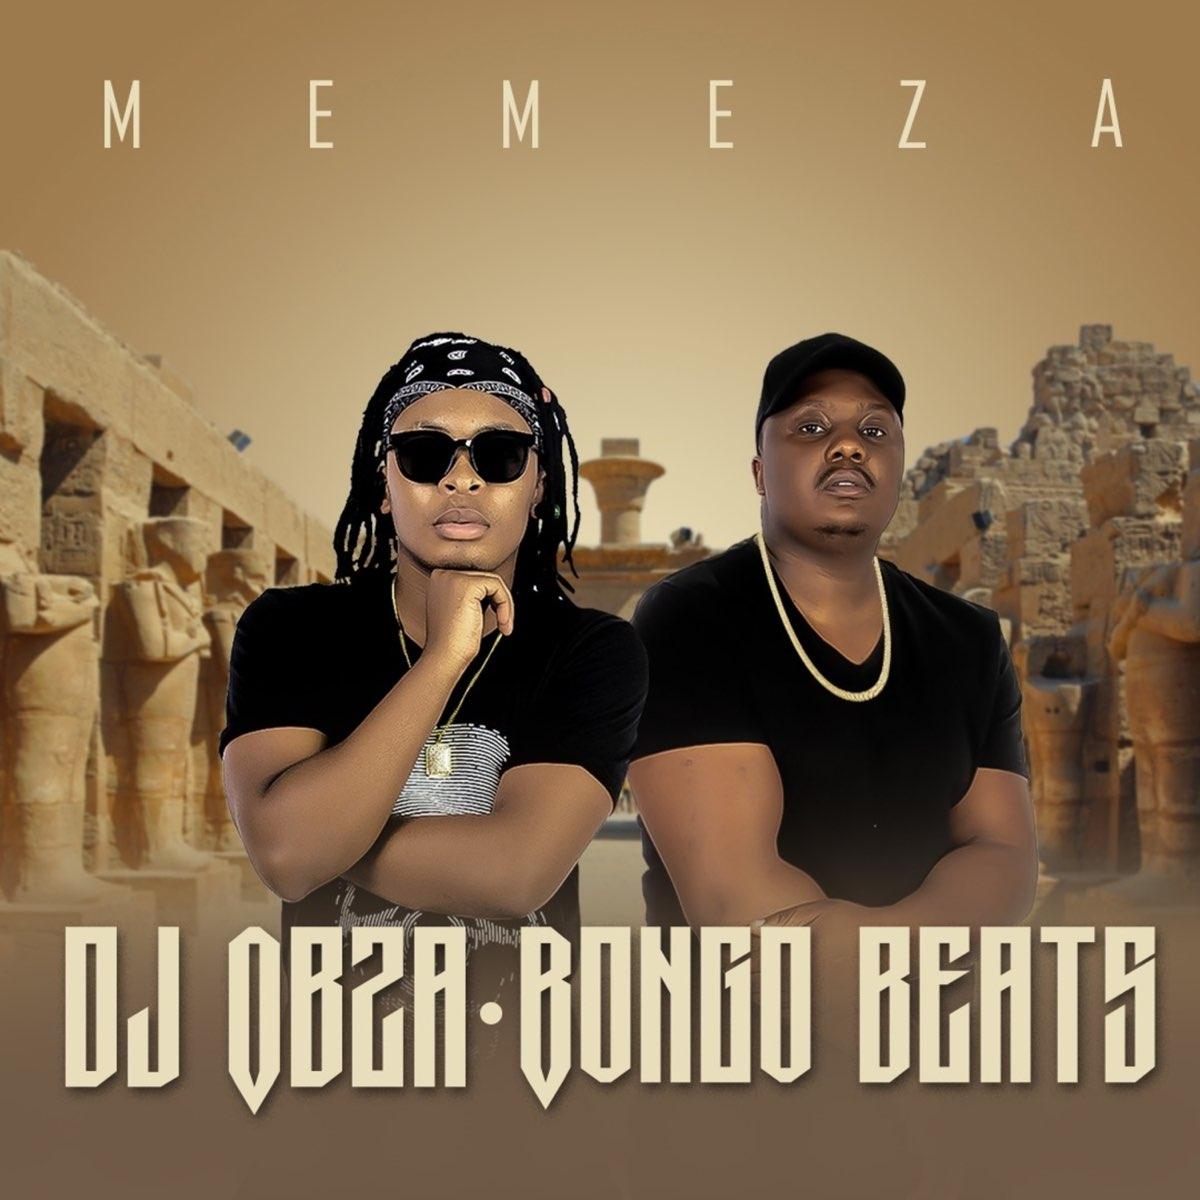 DJ Obza & Bongo Beats Ft. MaWhoo & DJ Gizo – Memeza mp3 download